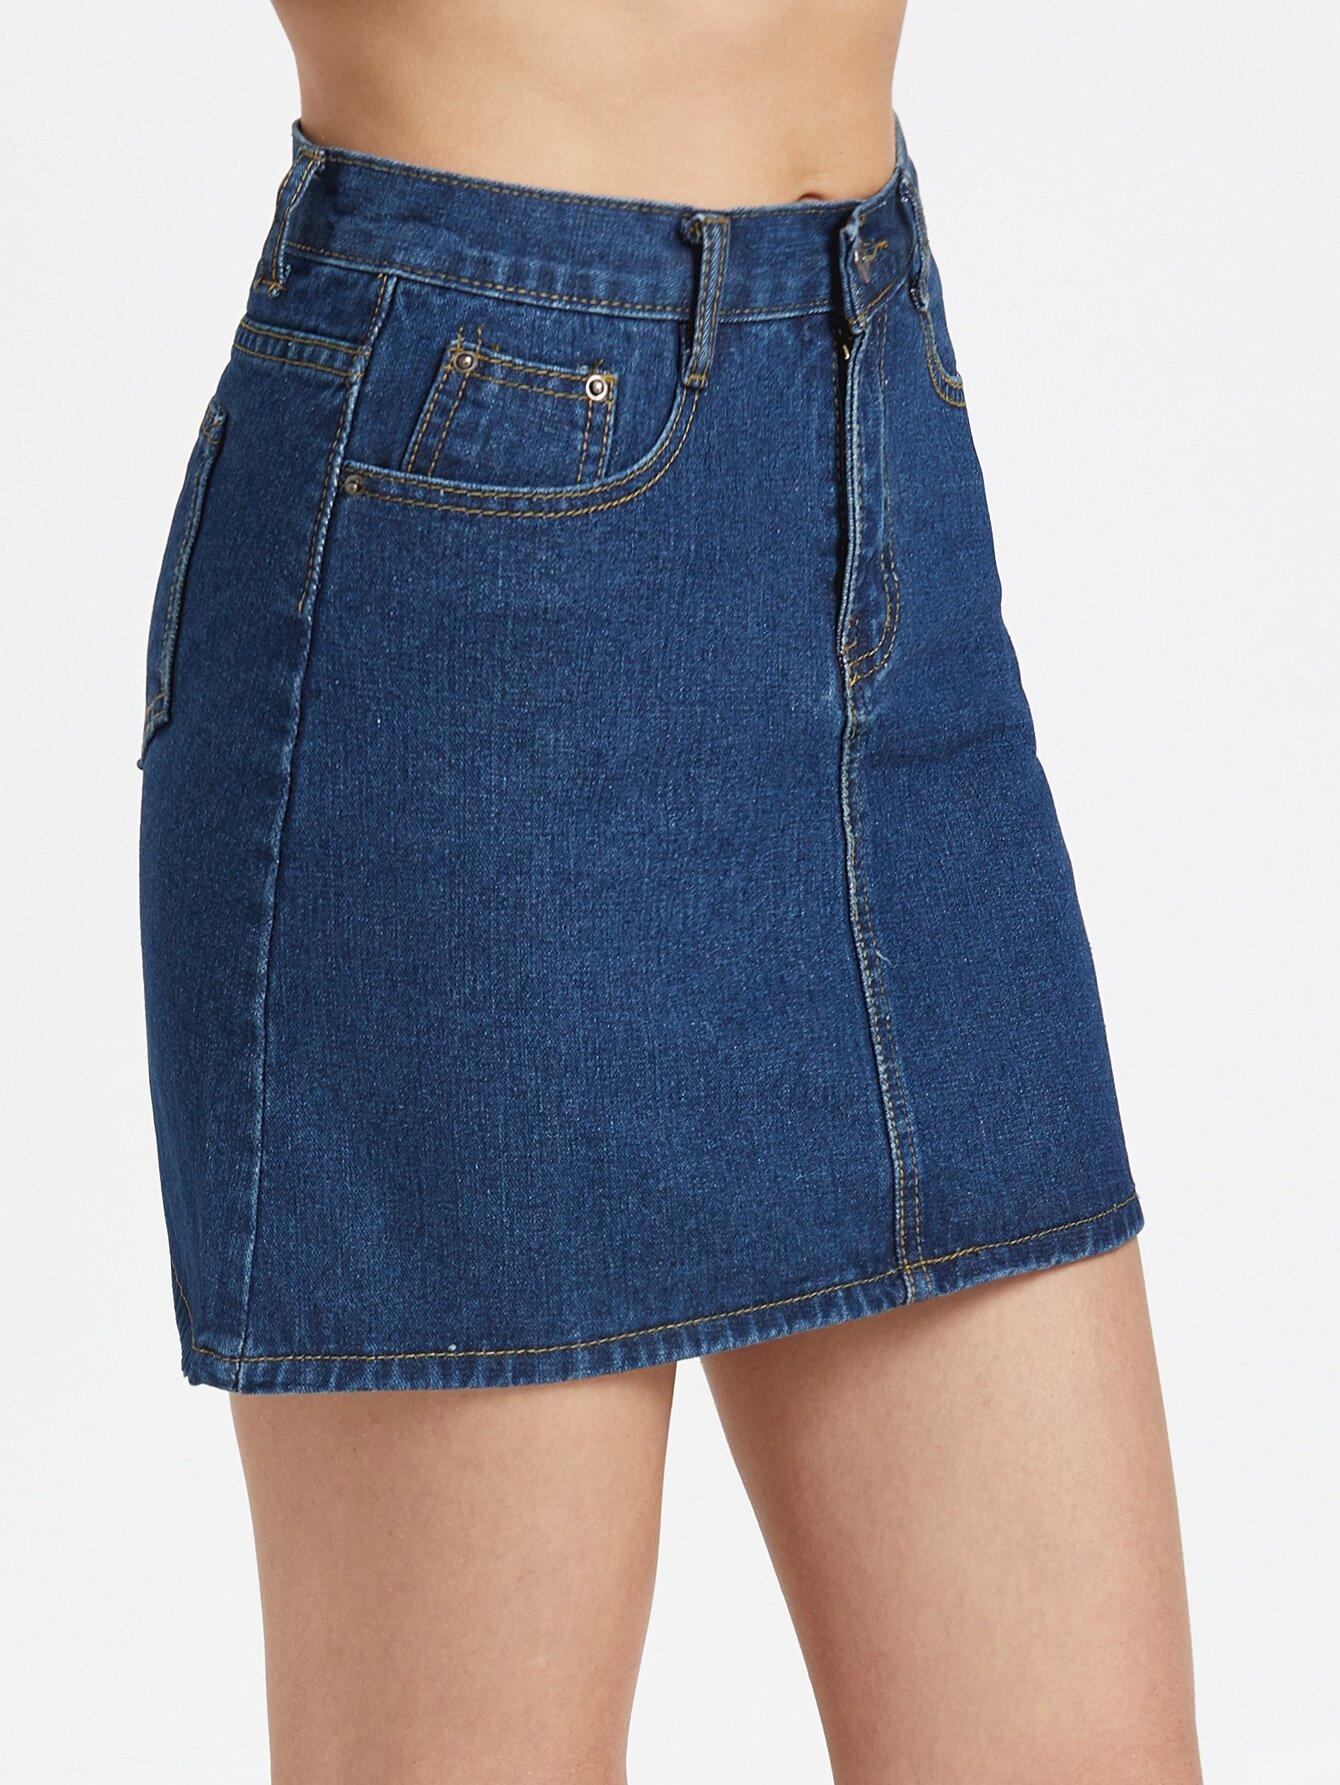 Dark Blue A-line Denim Skirt